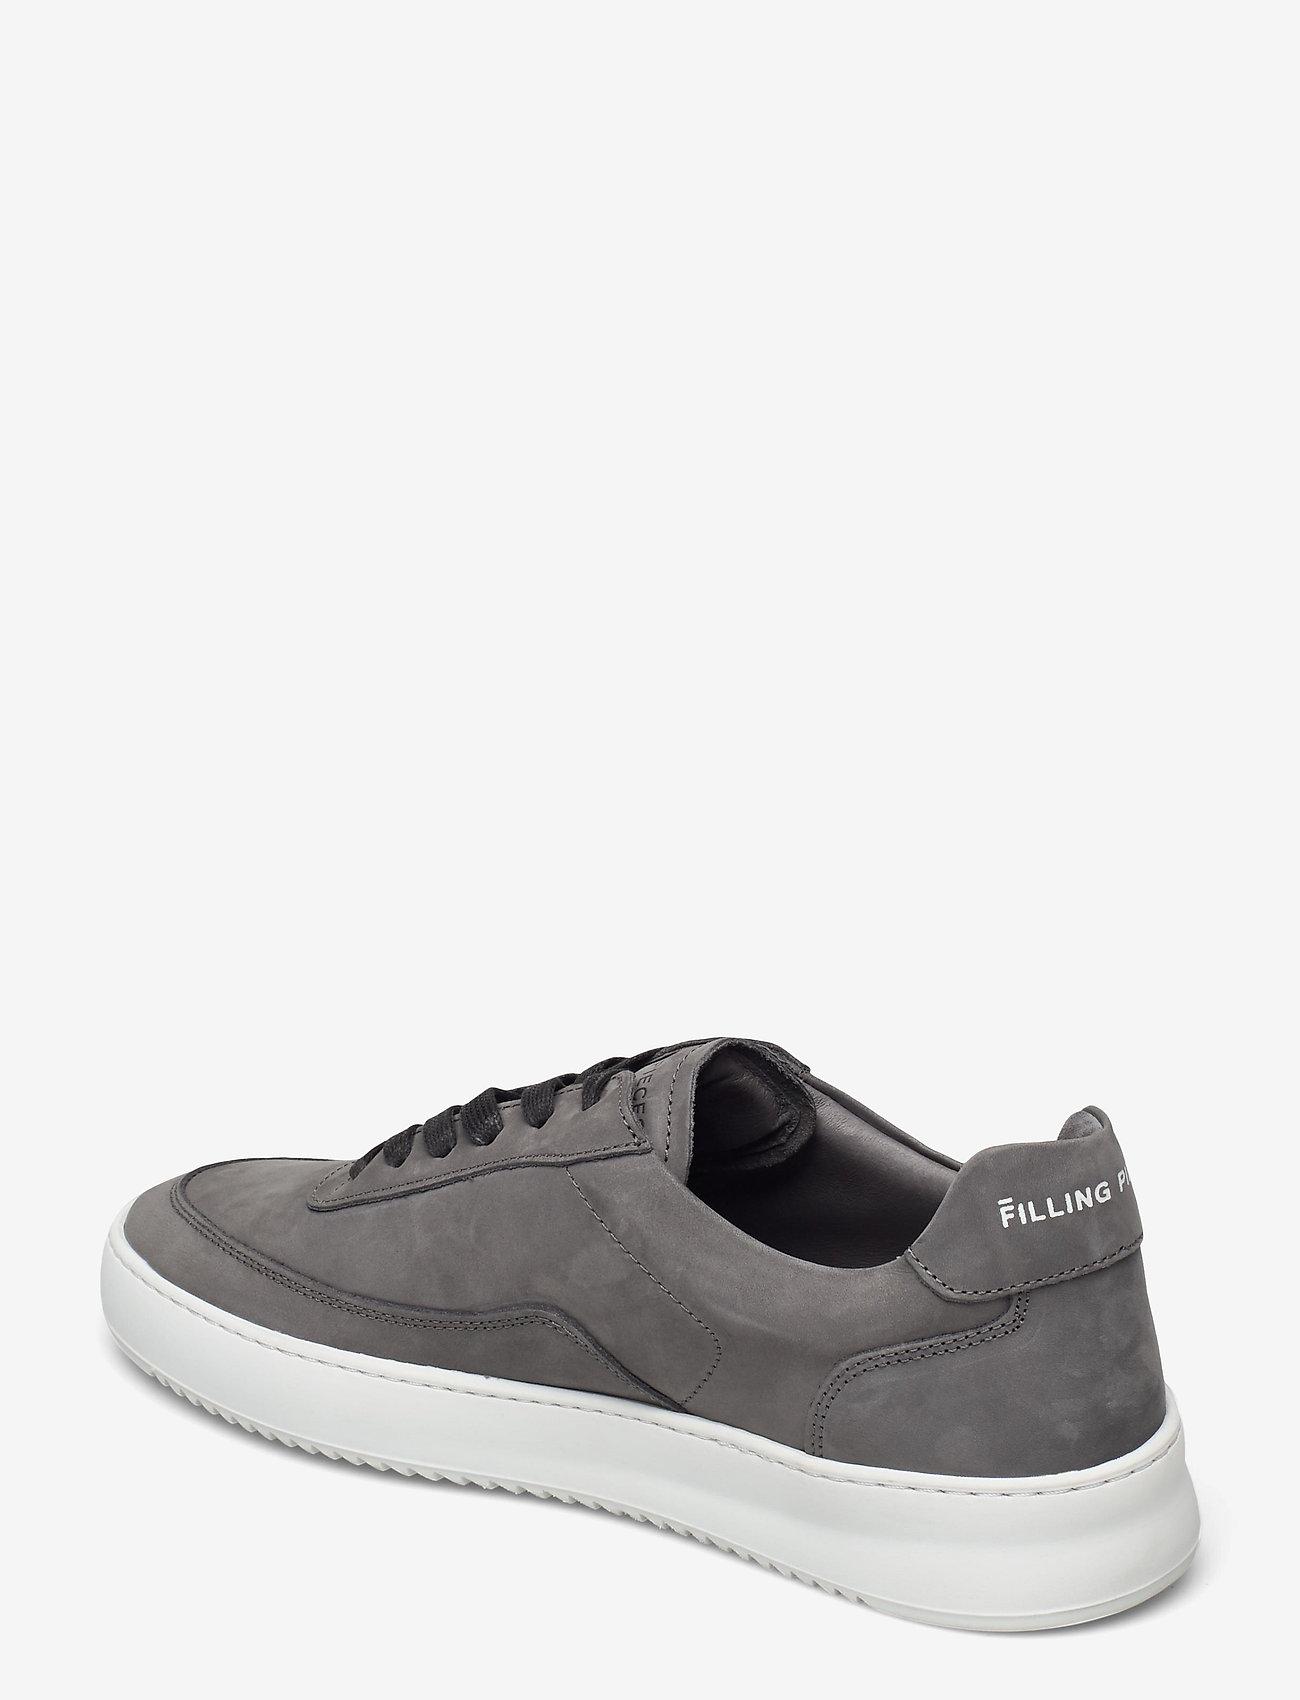 Filling Pieces - Mondo 2.0 Ripple Nubuck - låga sneakers - grey - 2